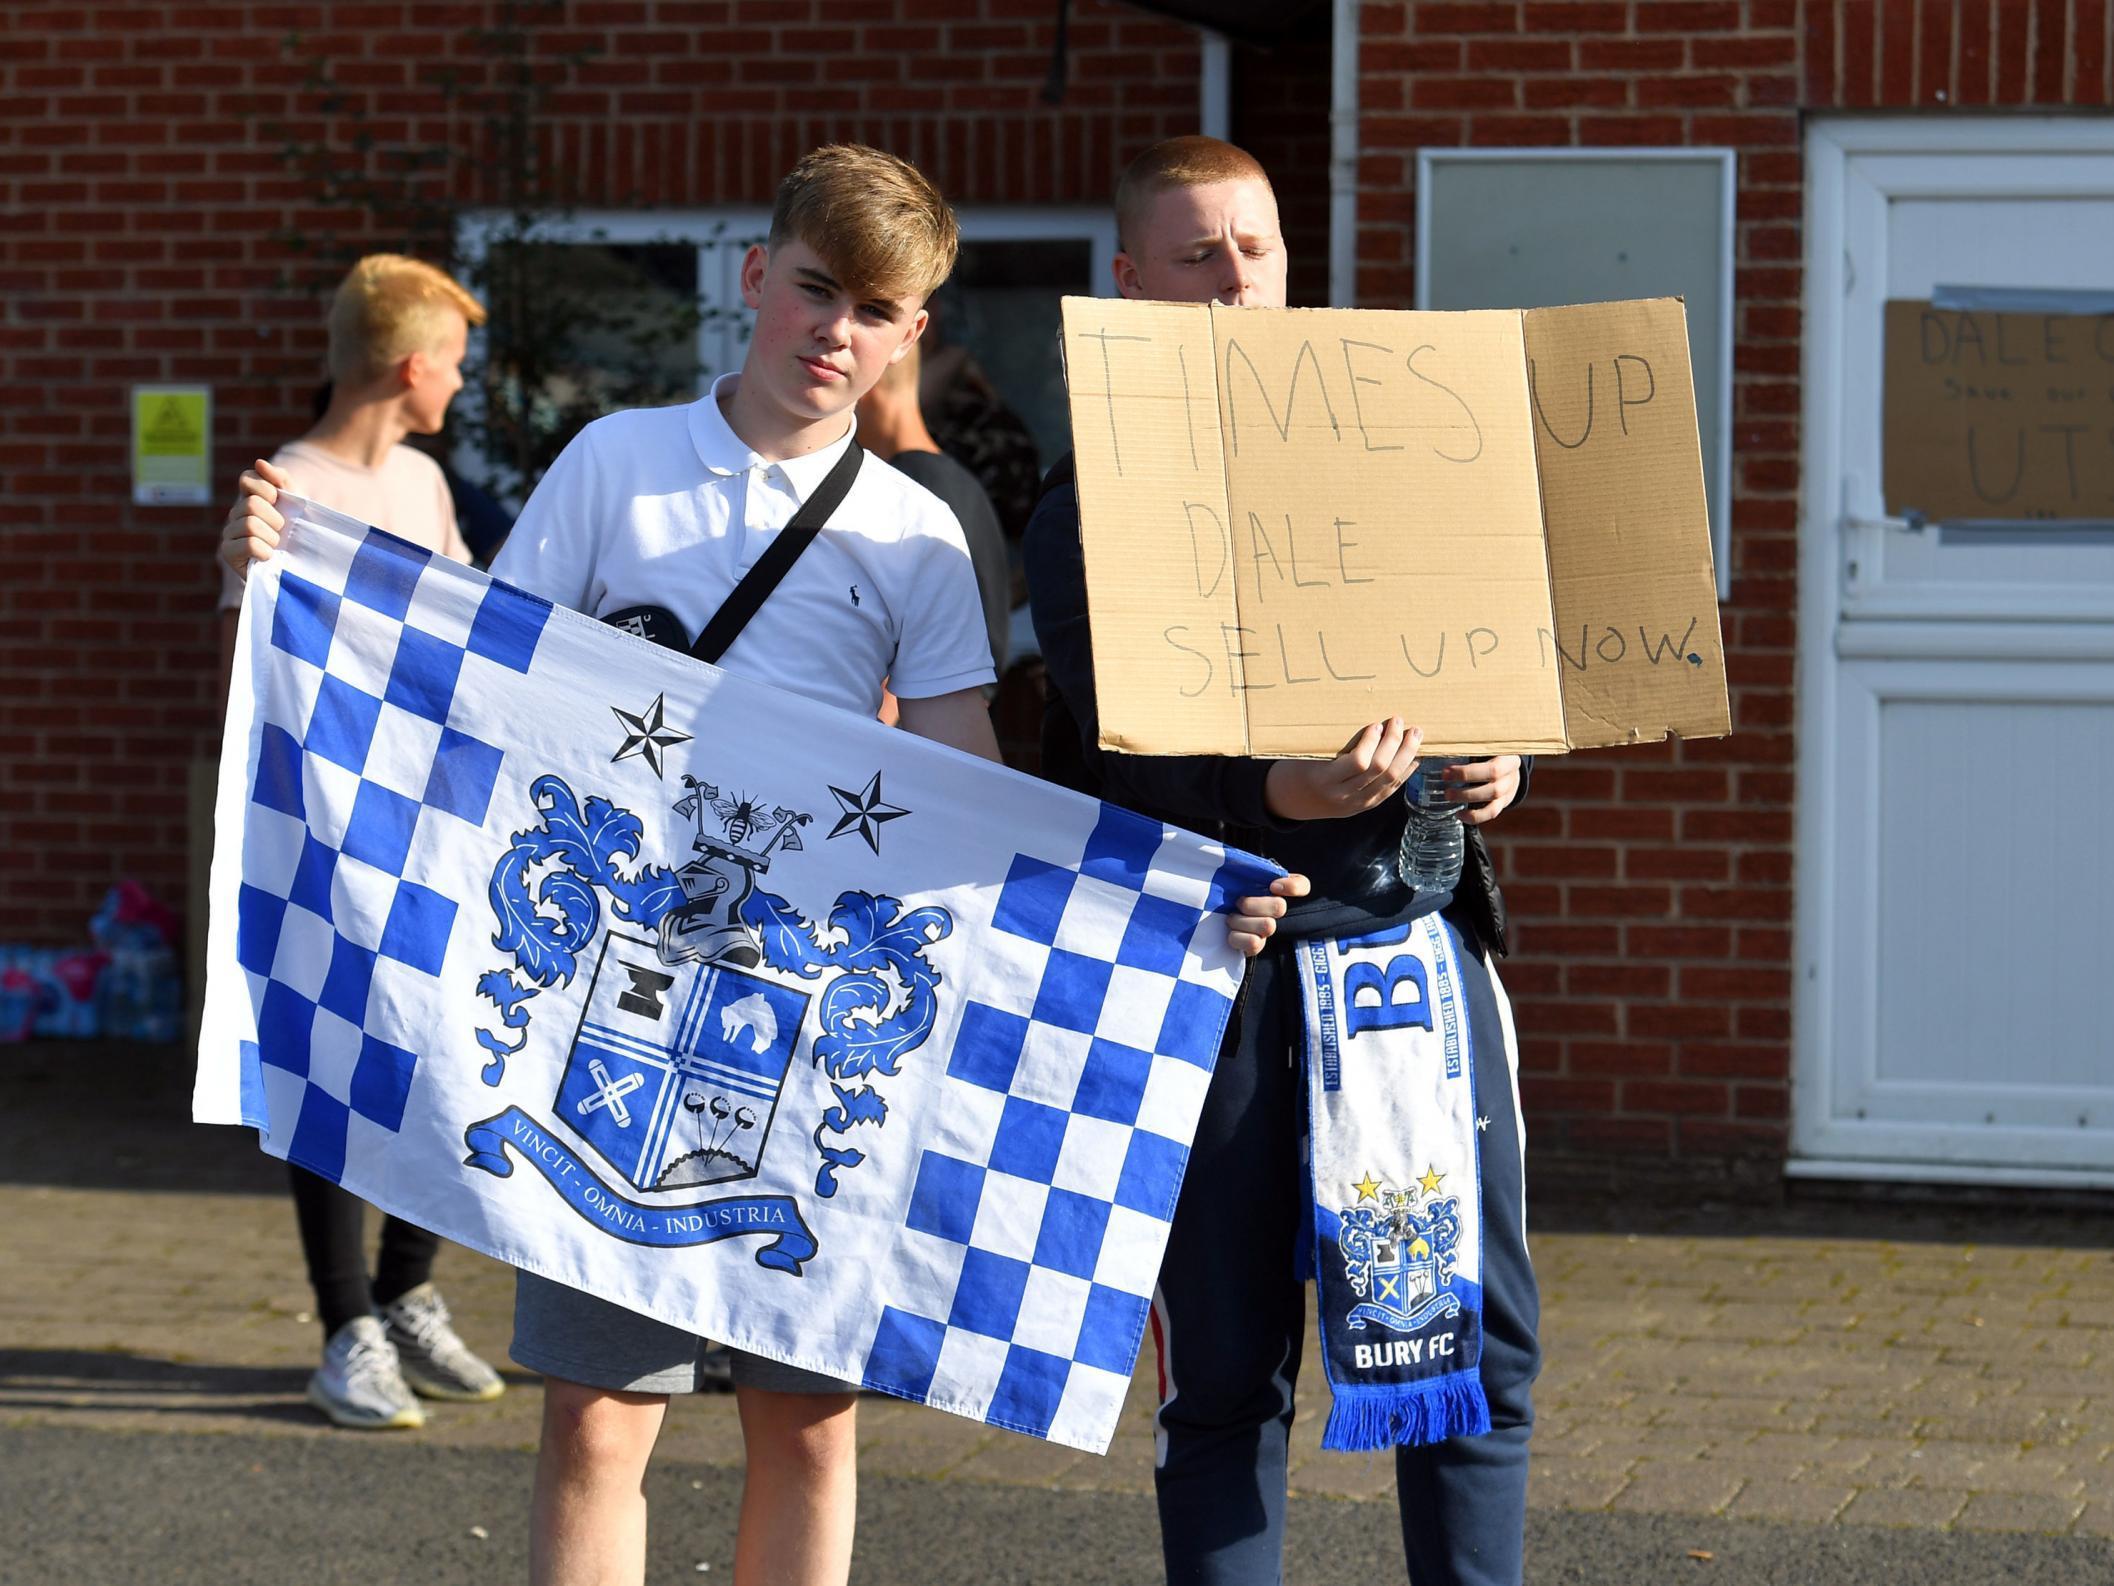 Bury FC owner Steve Dale says club has been sold hours before EFL de…